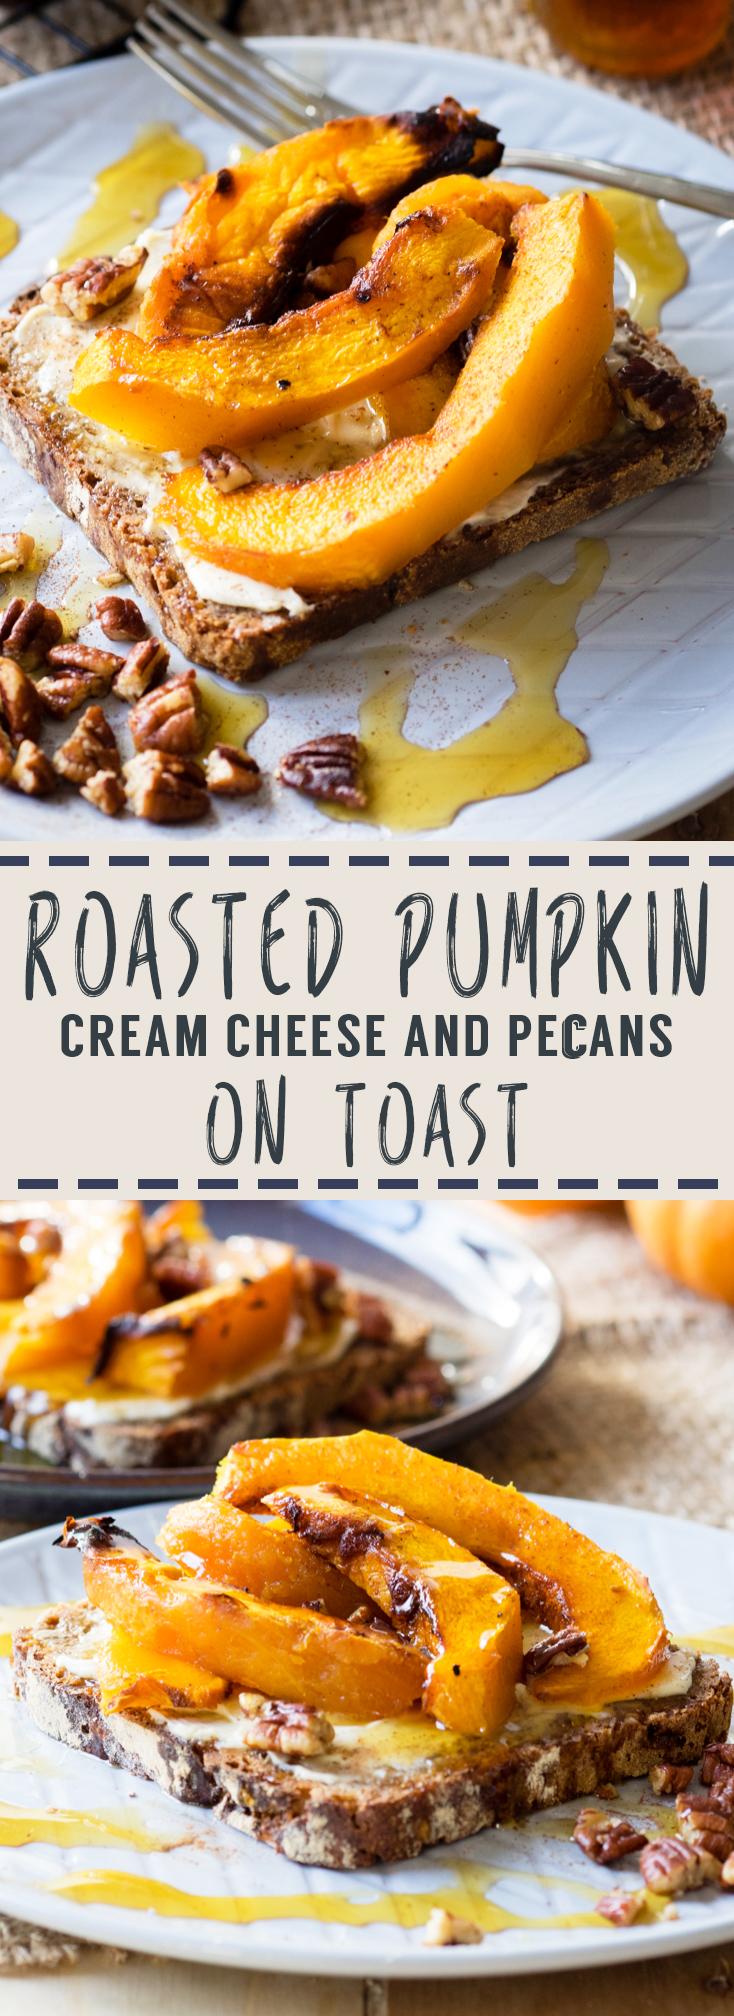 Roasted Pumpkin on Toast | The Worktop